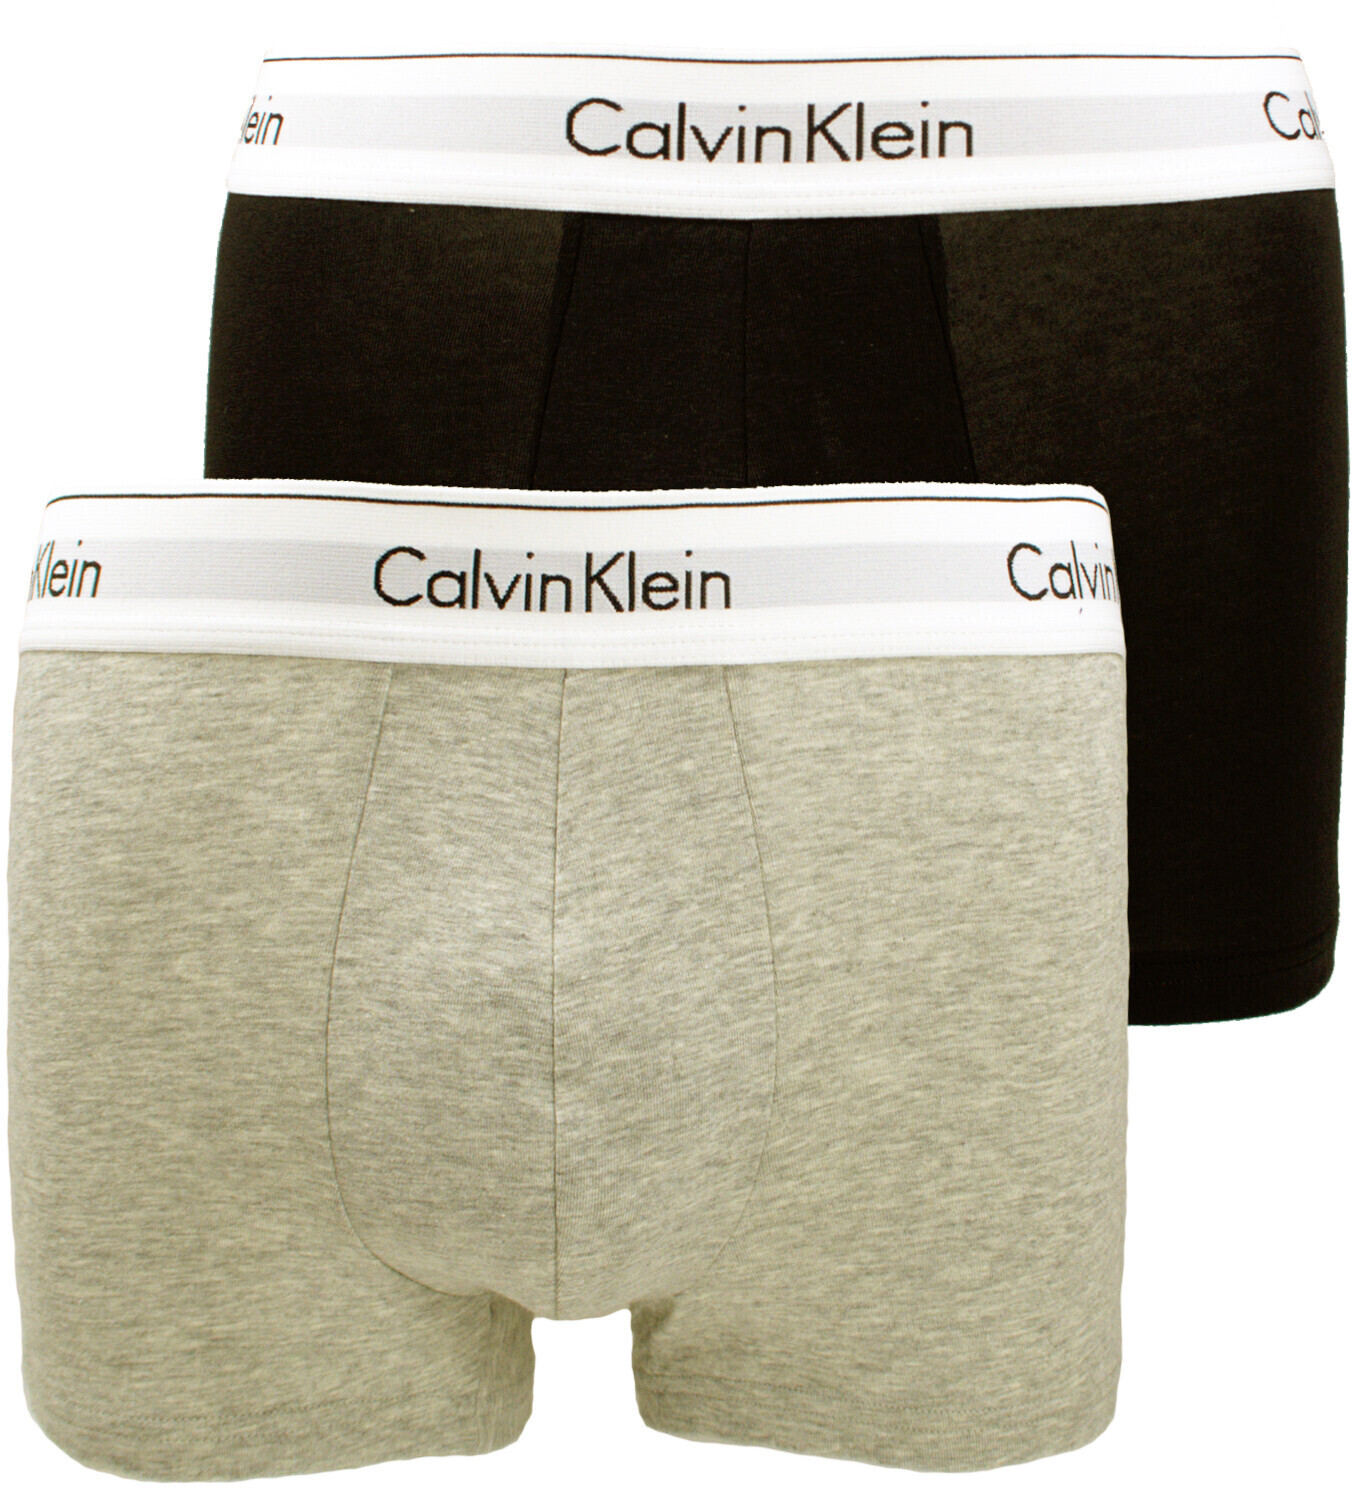 Image of Calvin Klein 2-Pack Boxershorts heather grey/black (NB1086A-BHY)